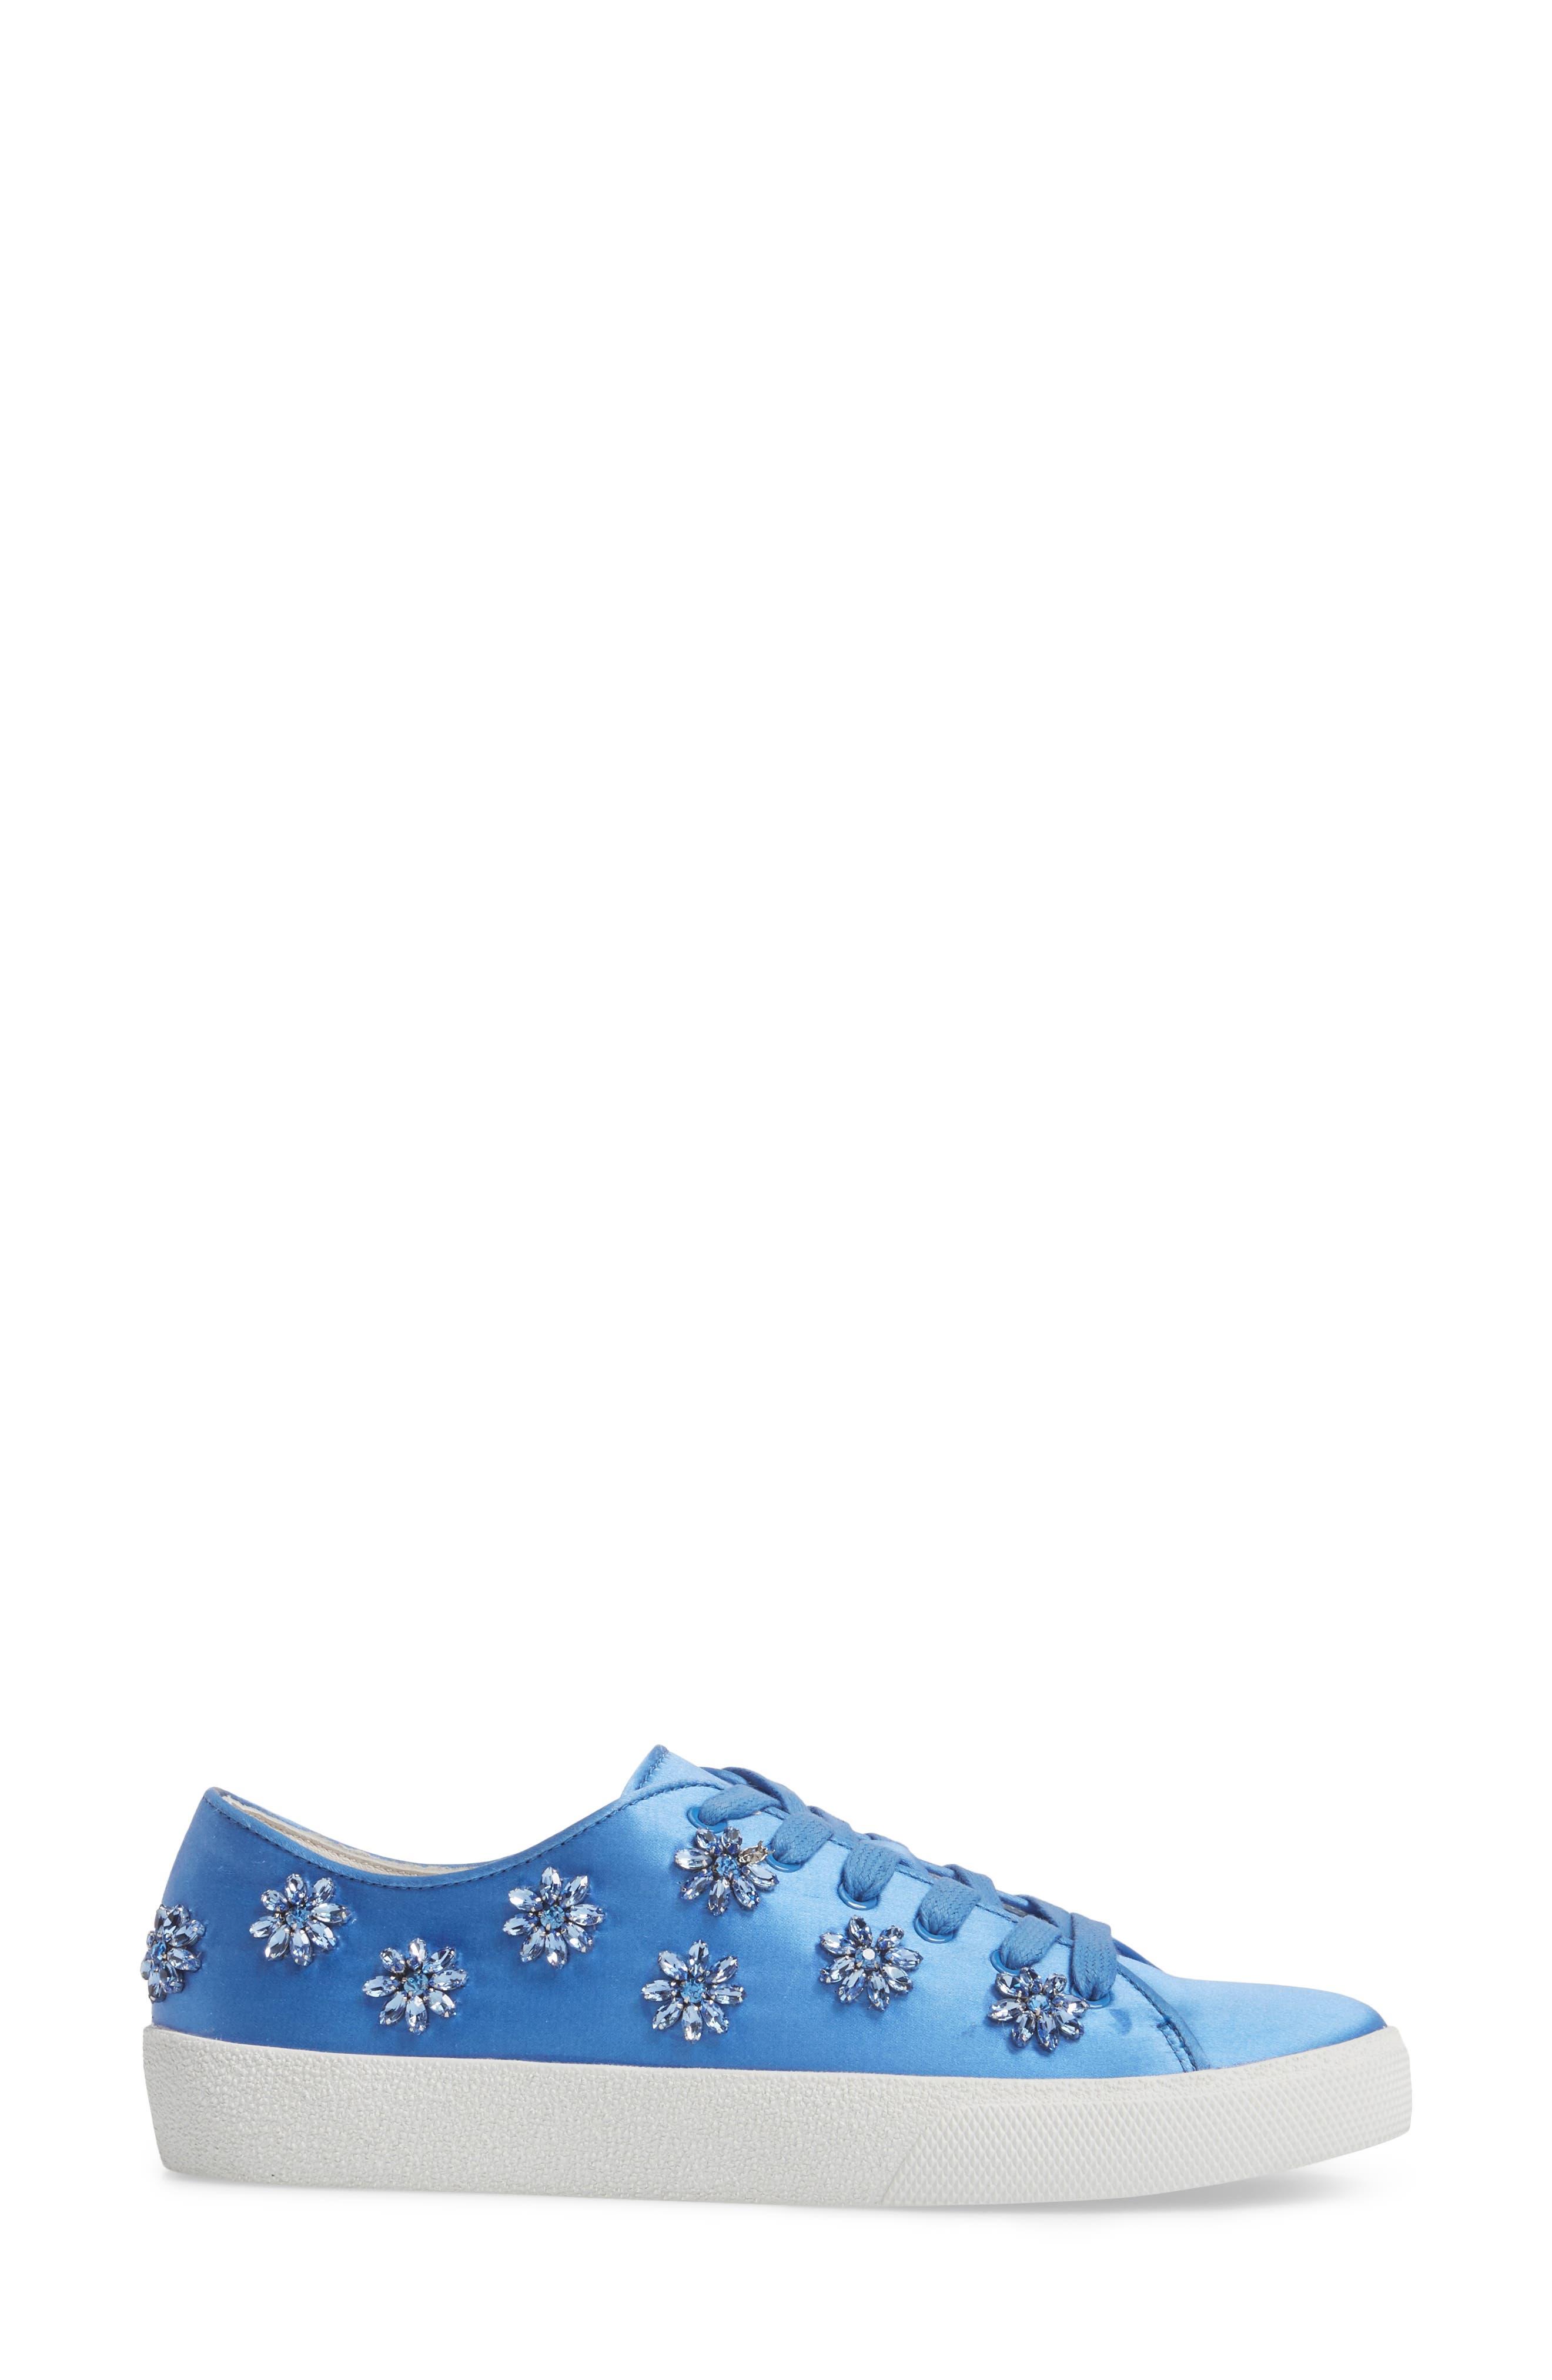 Cleo Crystal Embellished Sneaker,                             Alternate thumbnail 3, color,                             Cerulean